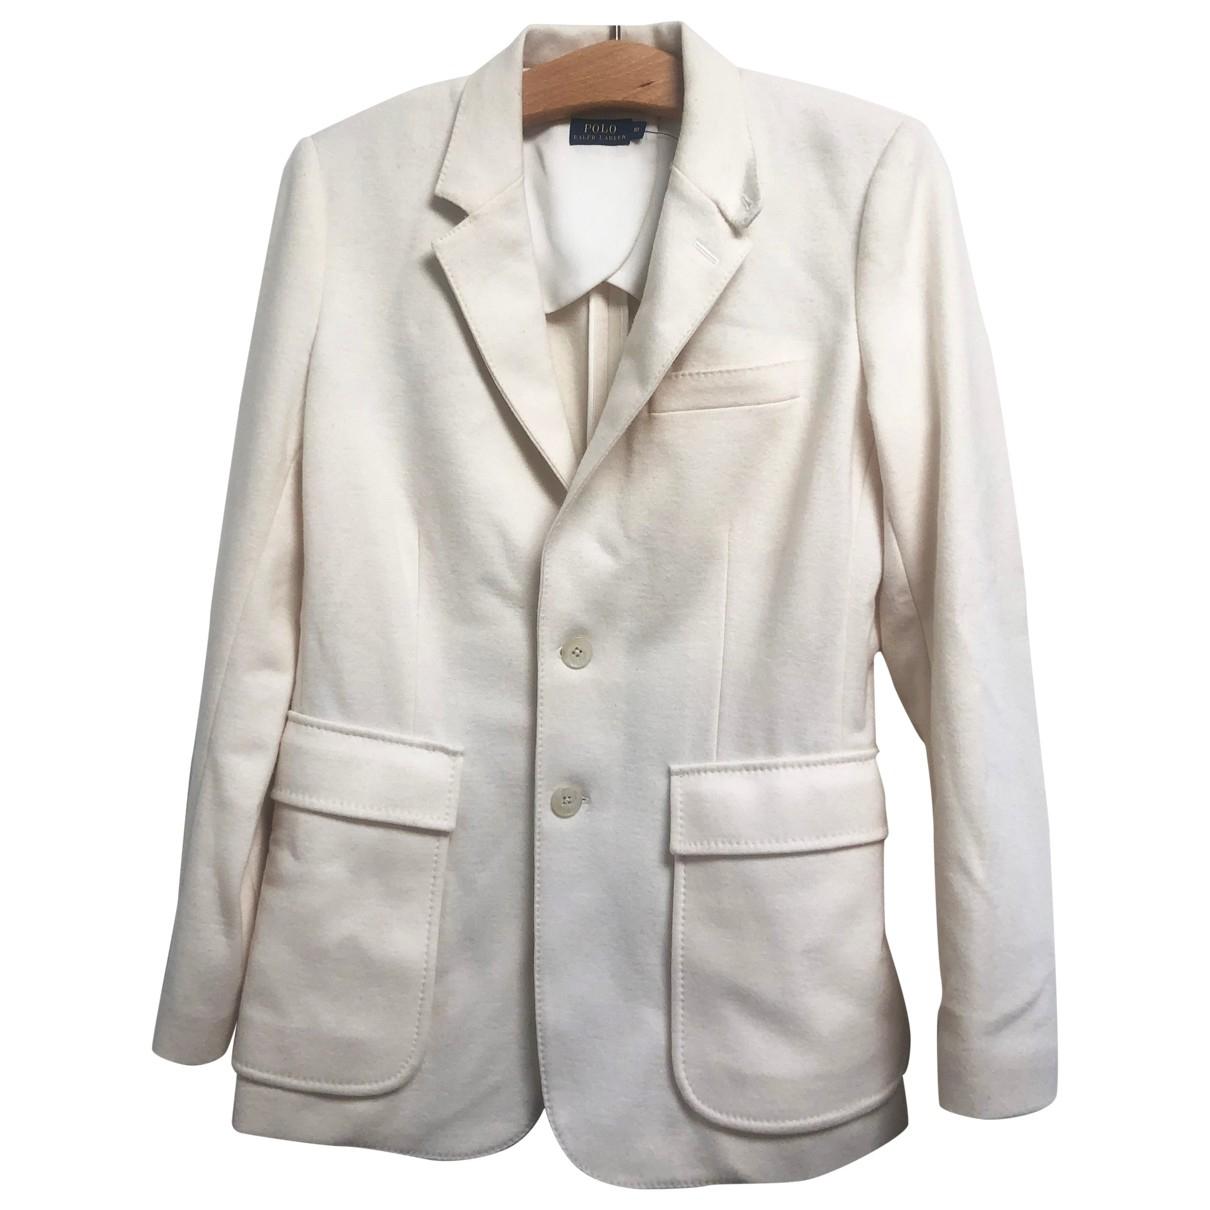 Polo Ralph Lauren \N White Wool jacket for Women M International